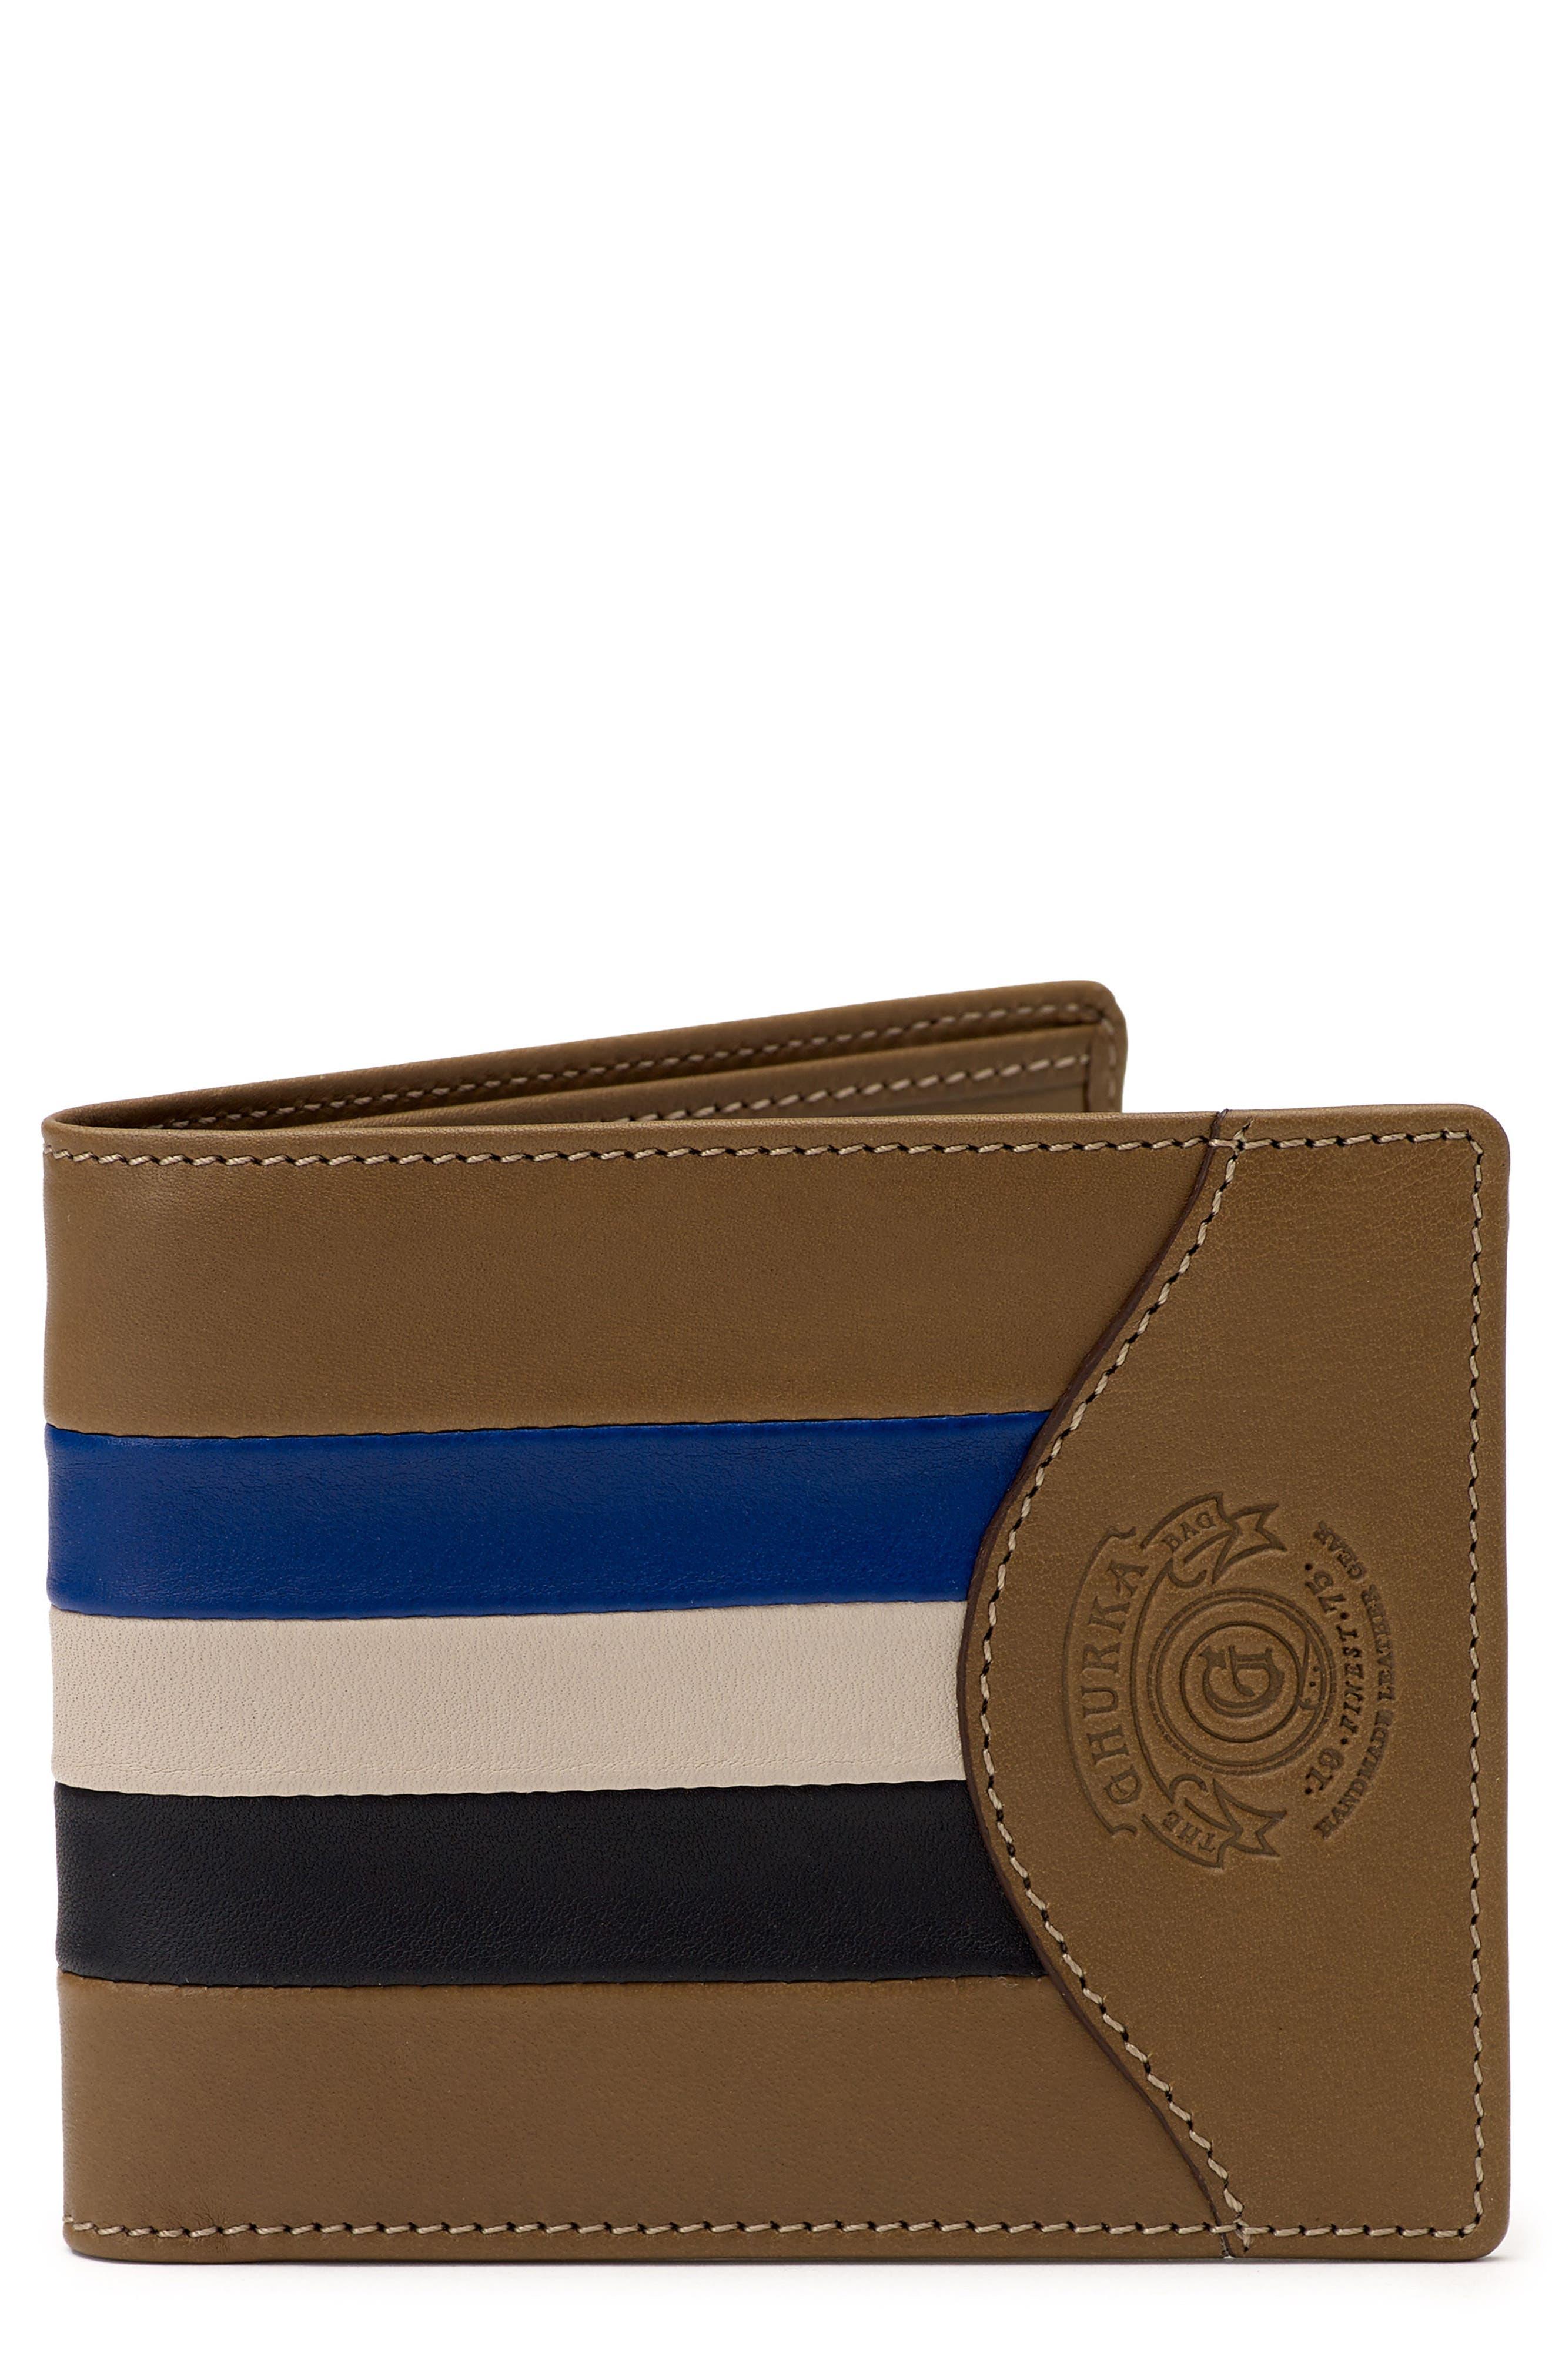 Ghurka Leather Wallet